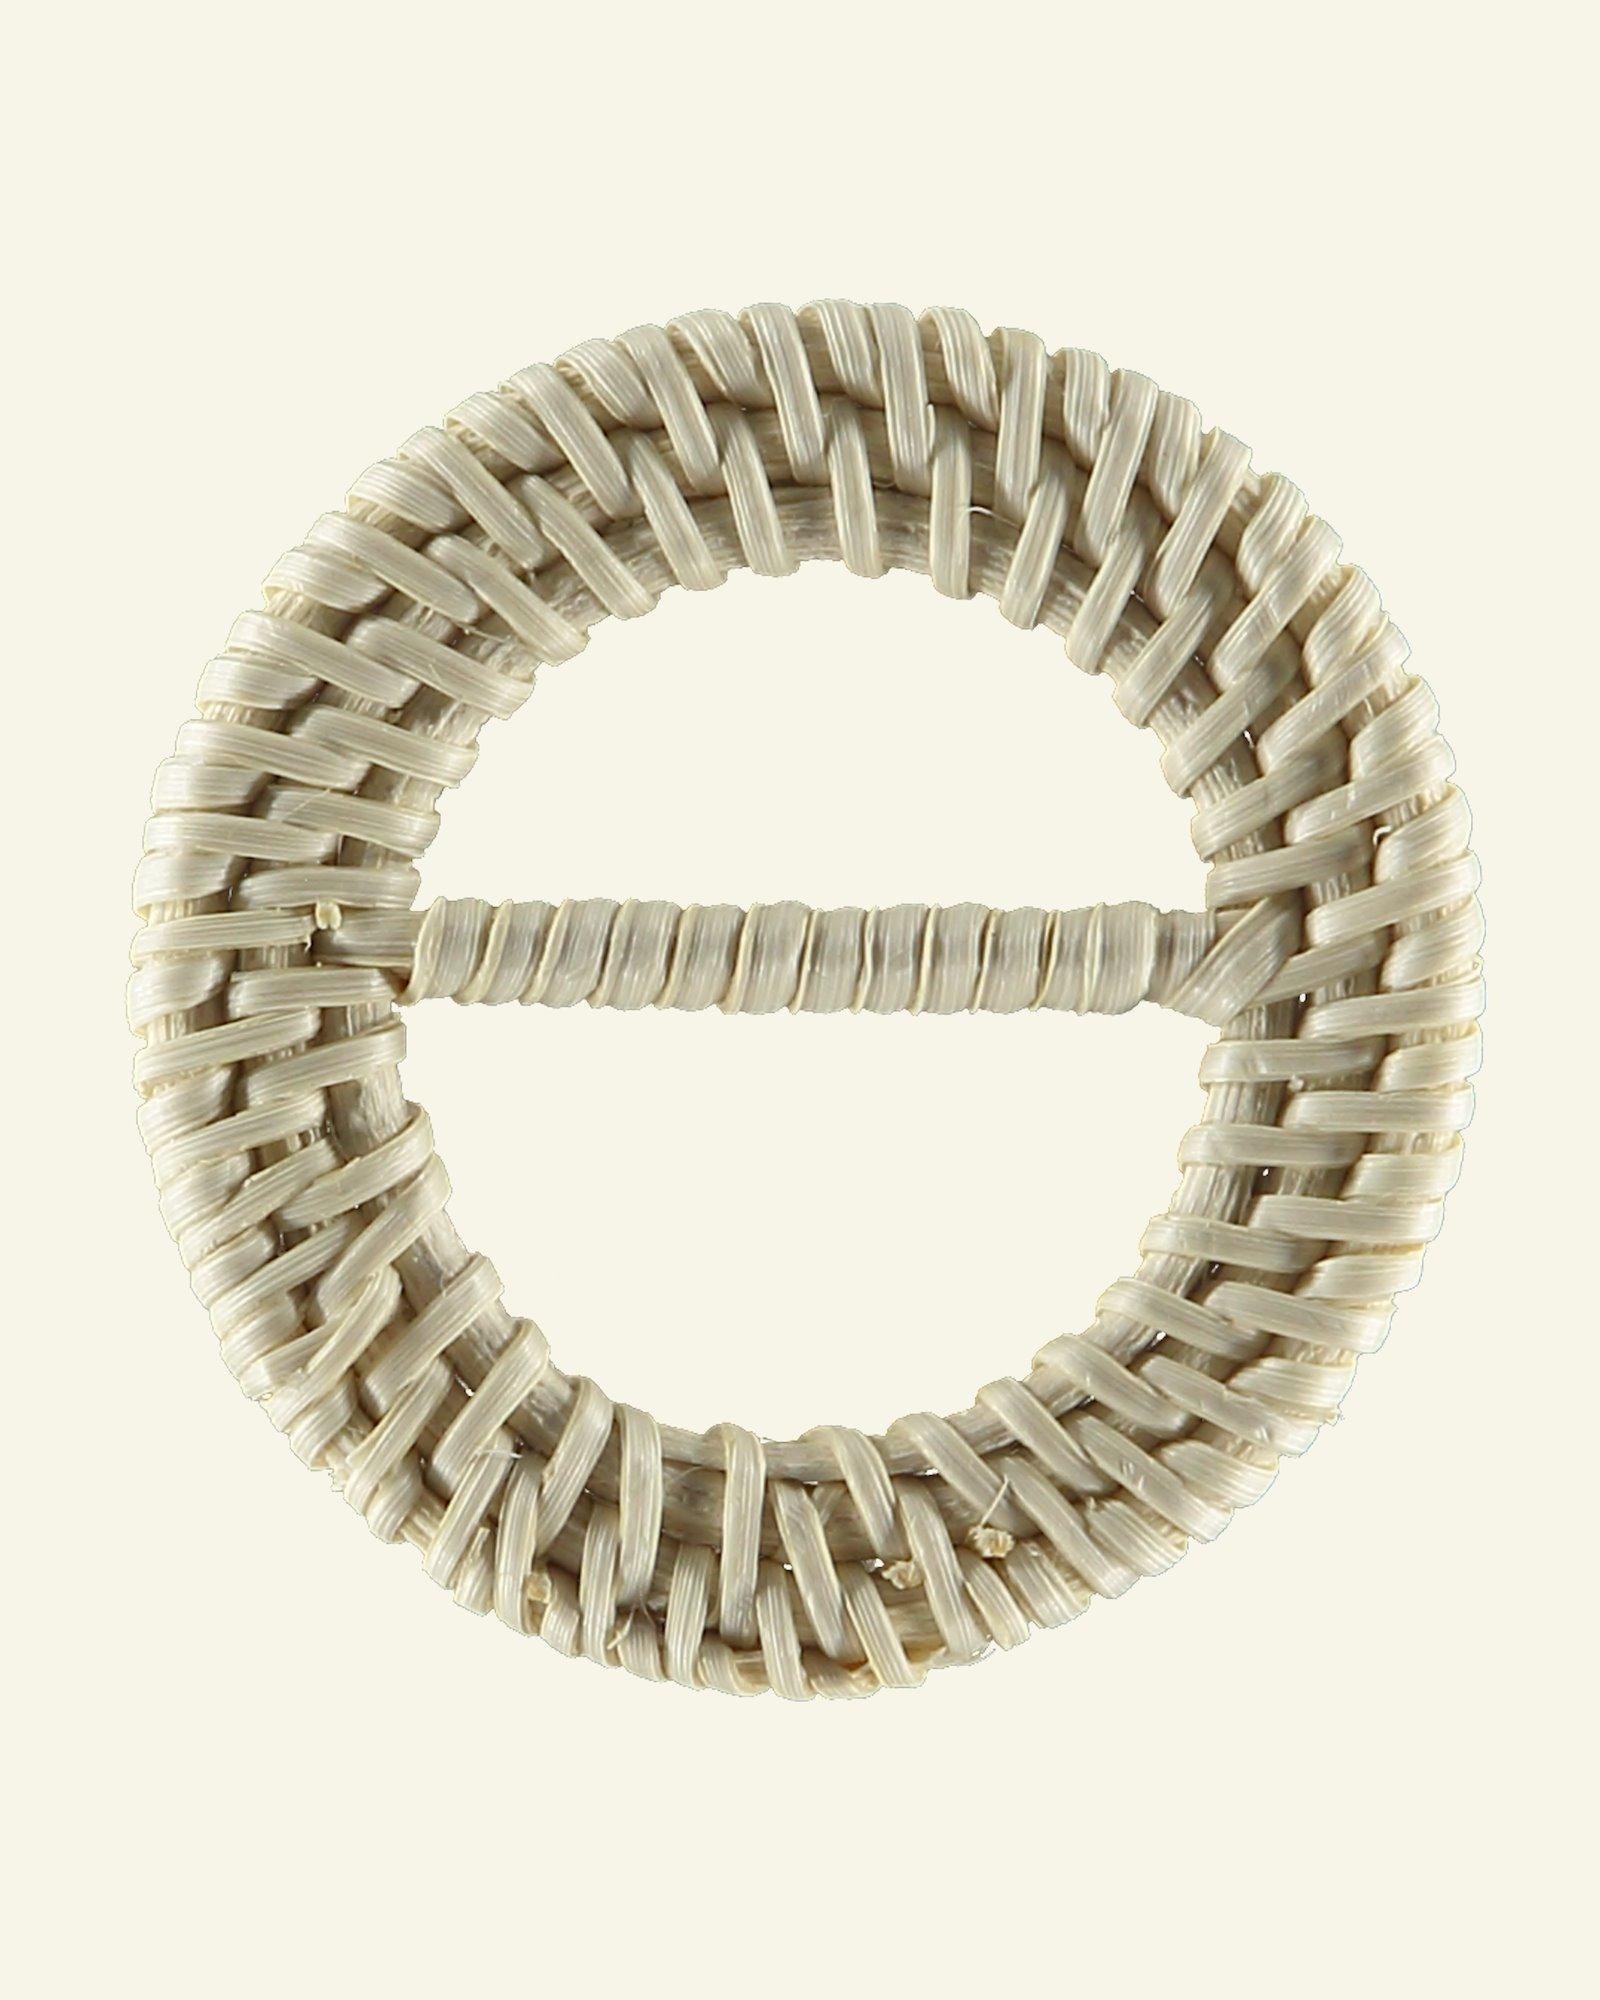 Belt buckle round appr. 60/40mm 1pc